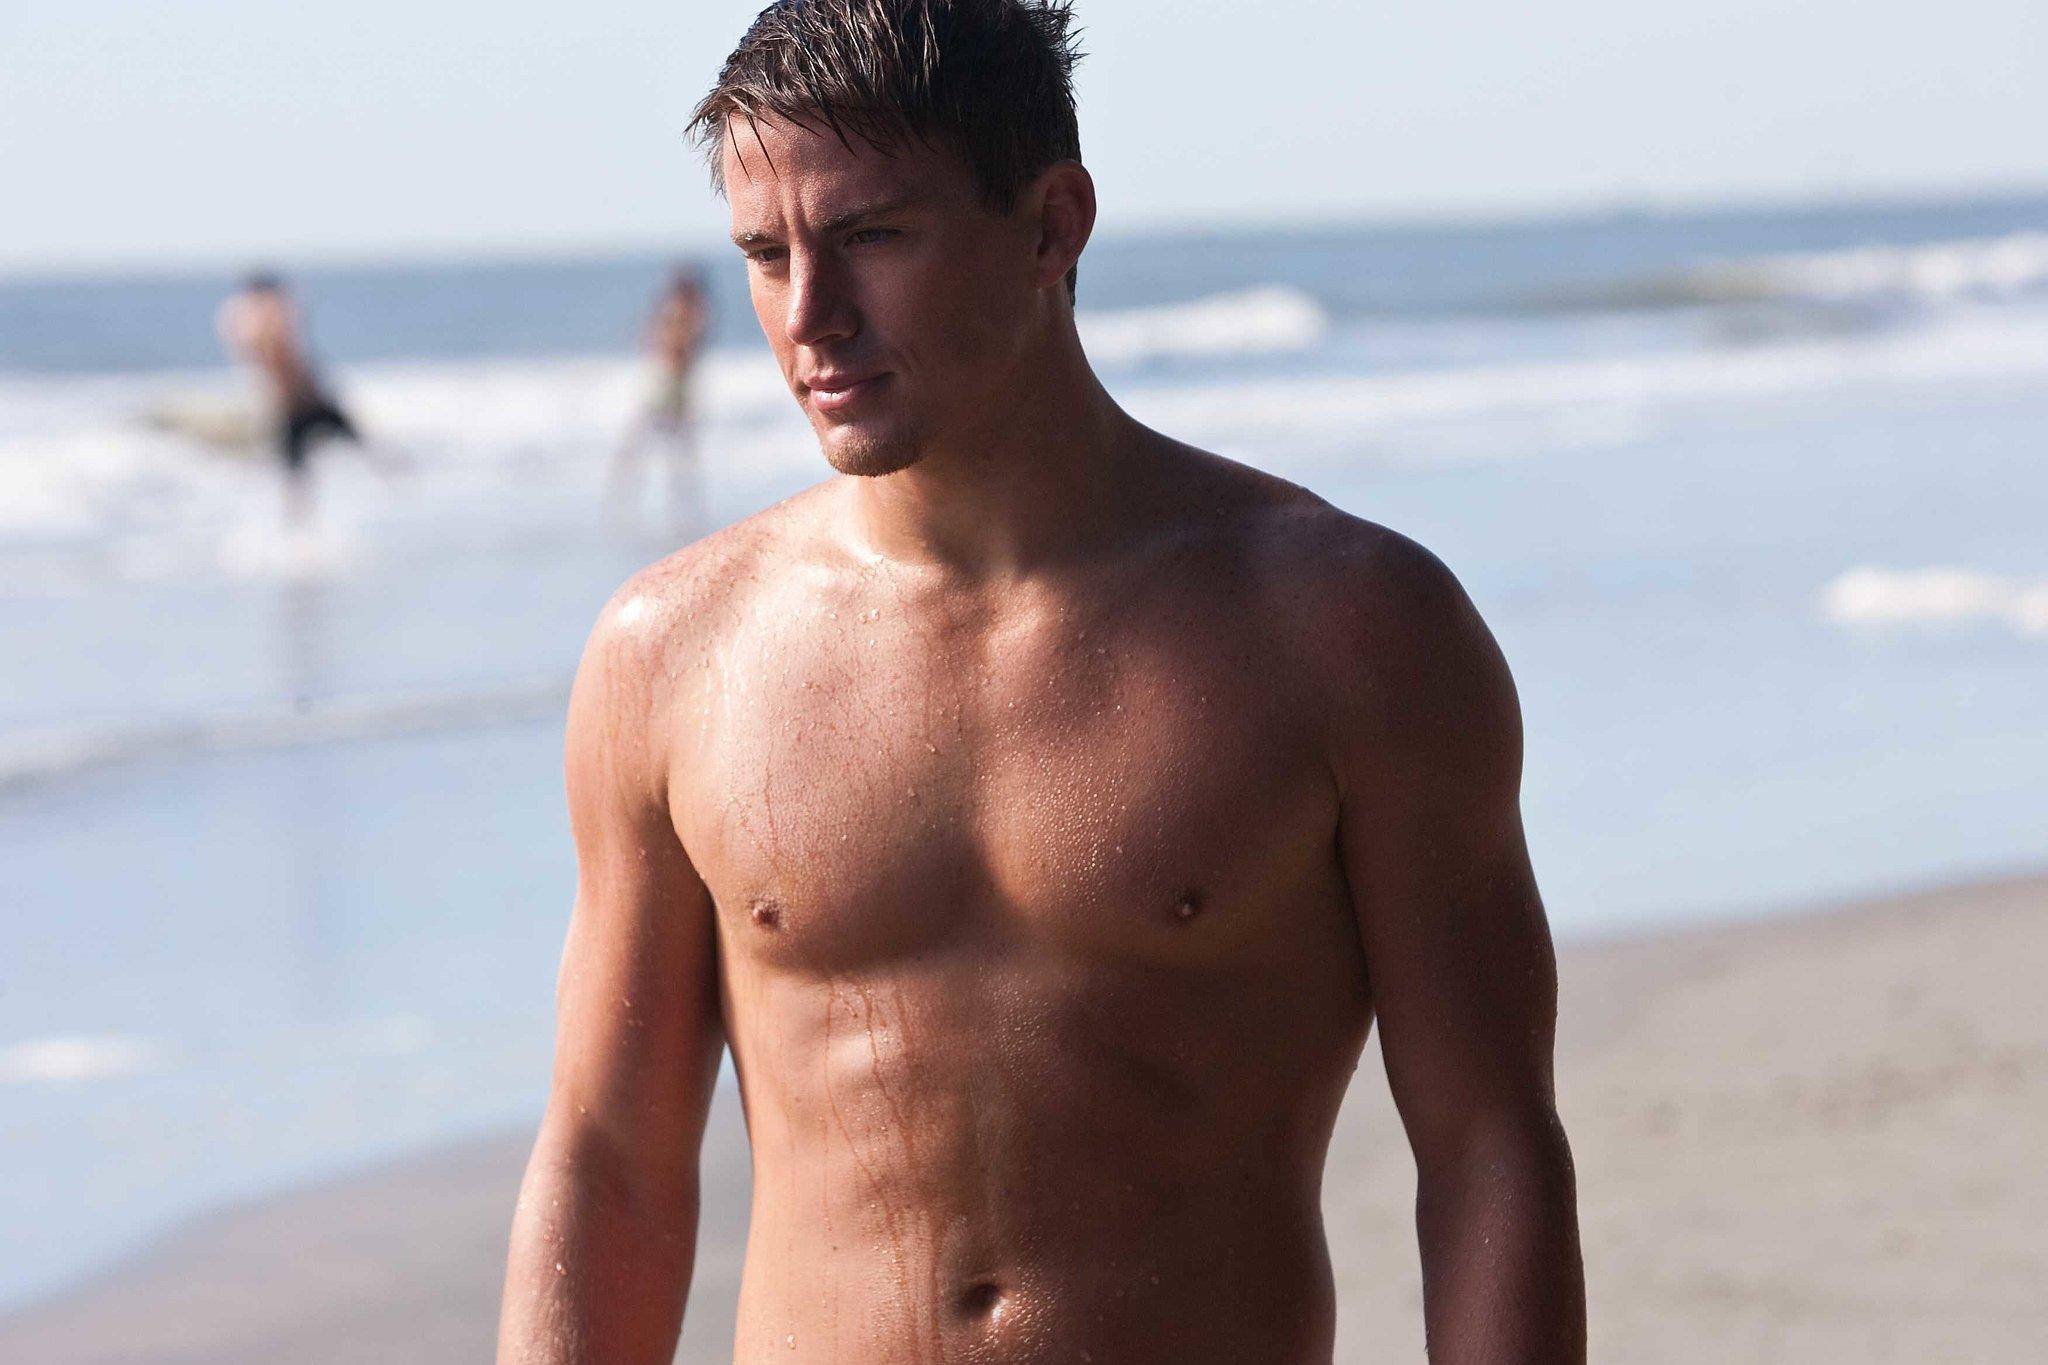 Channing went shirtless in Dear John.